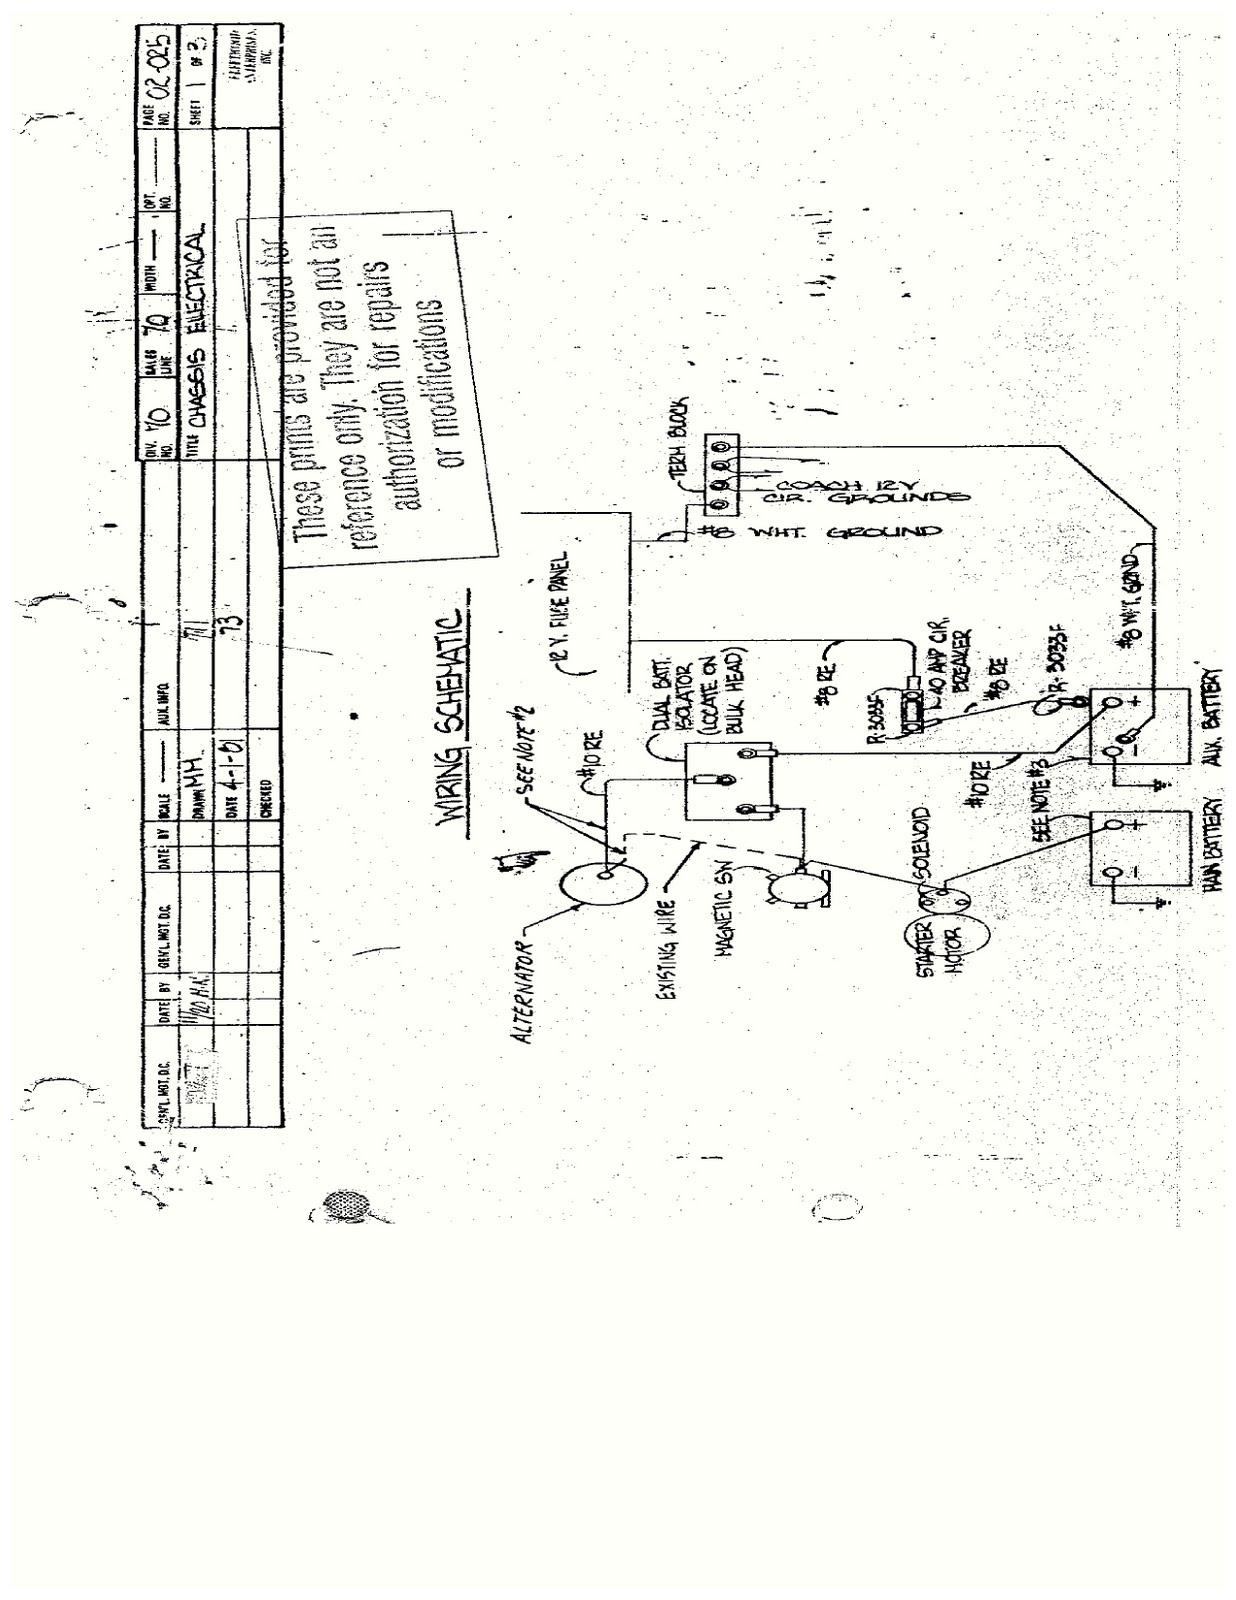 1976 corvette fuse panel diagram